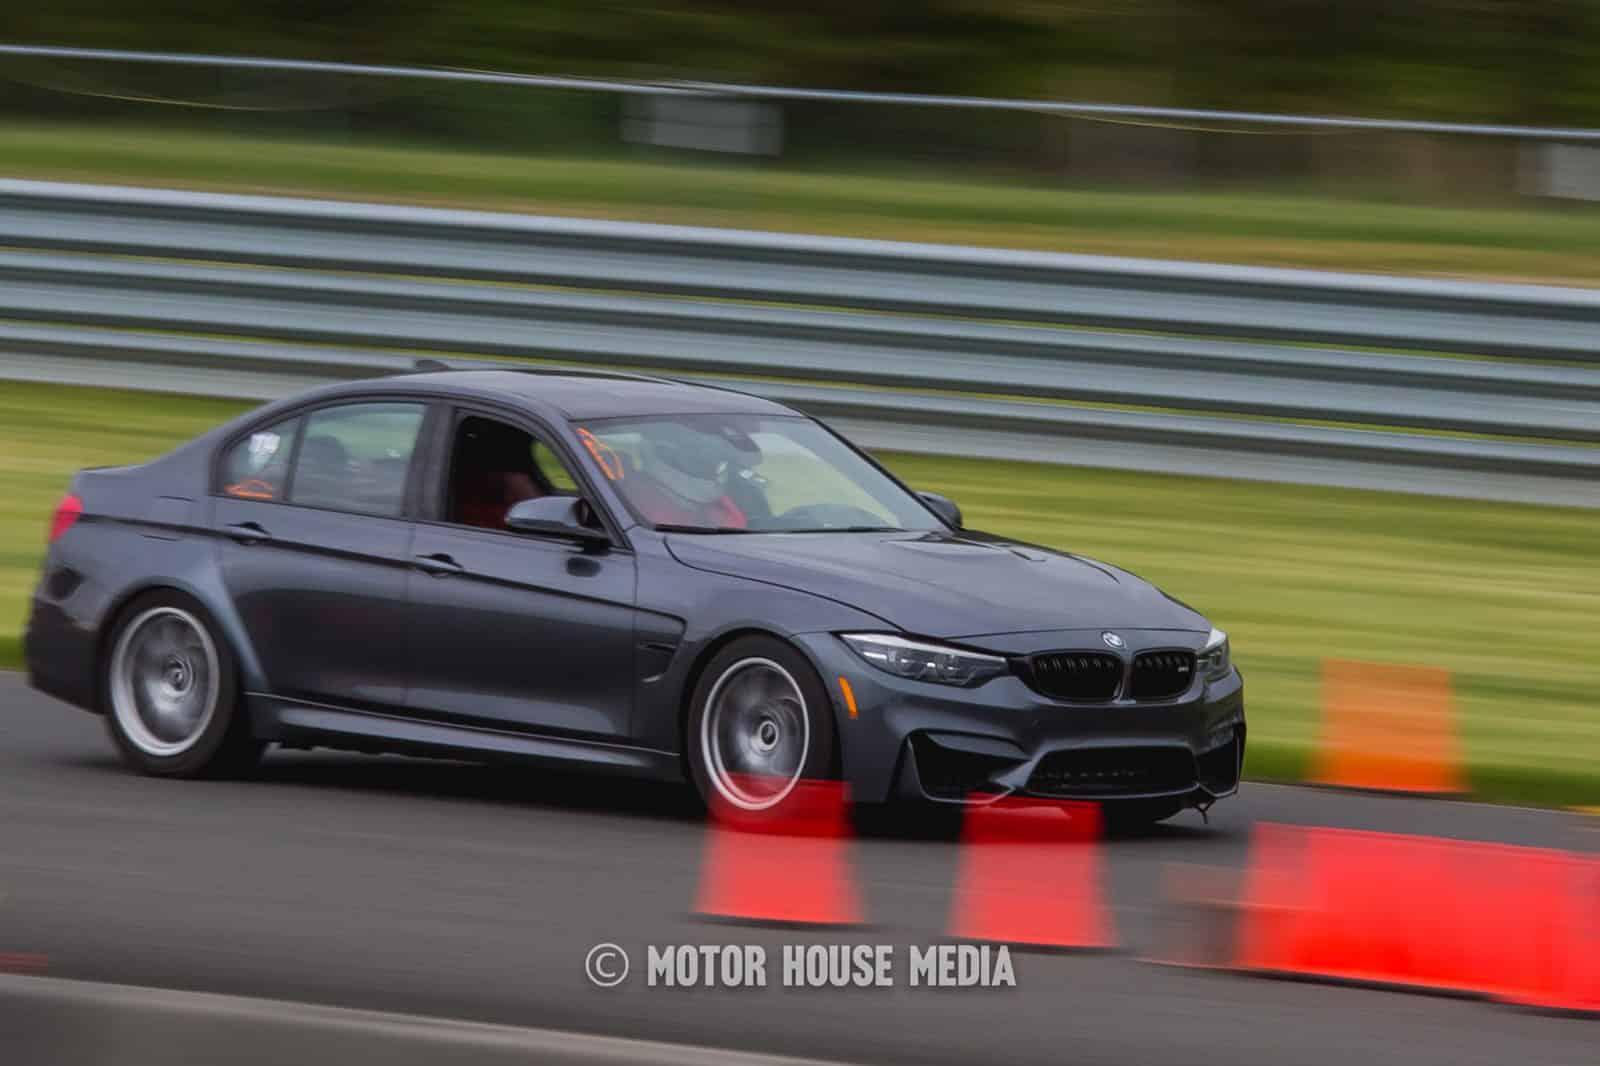 BMW roll racing